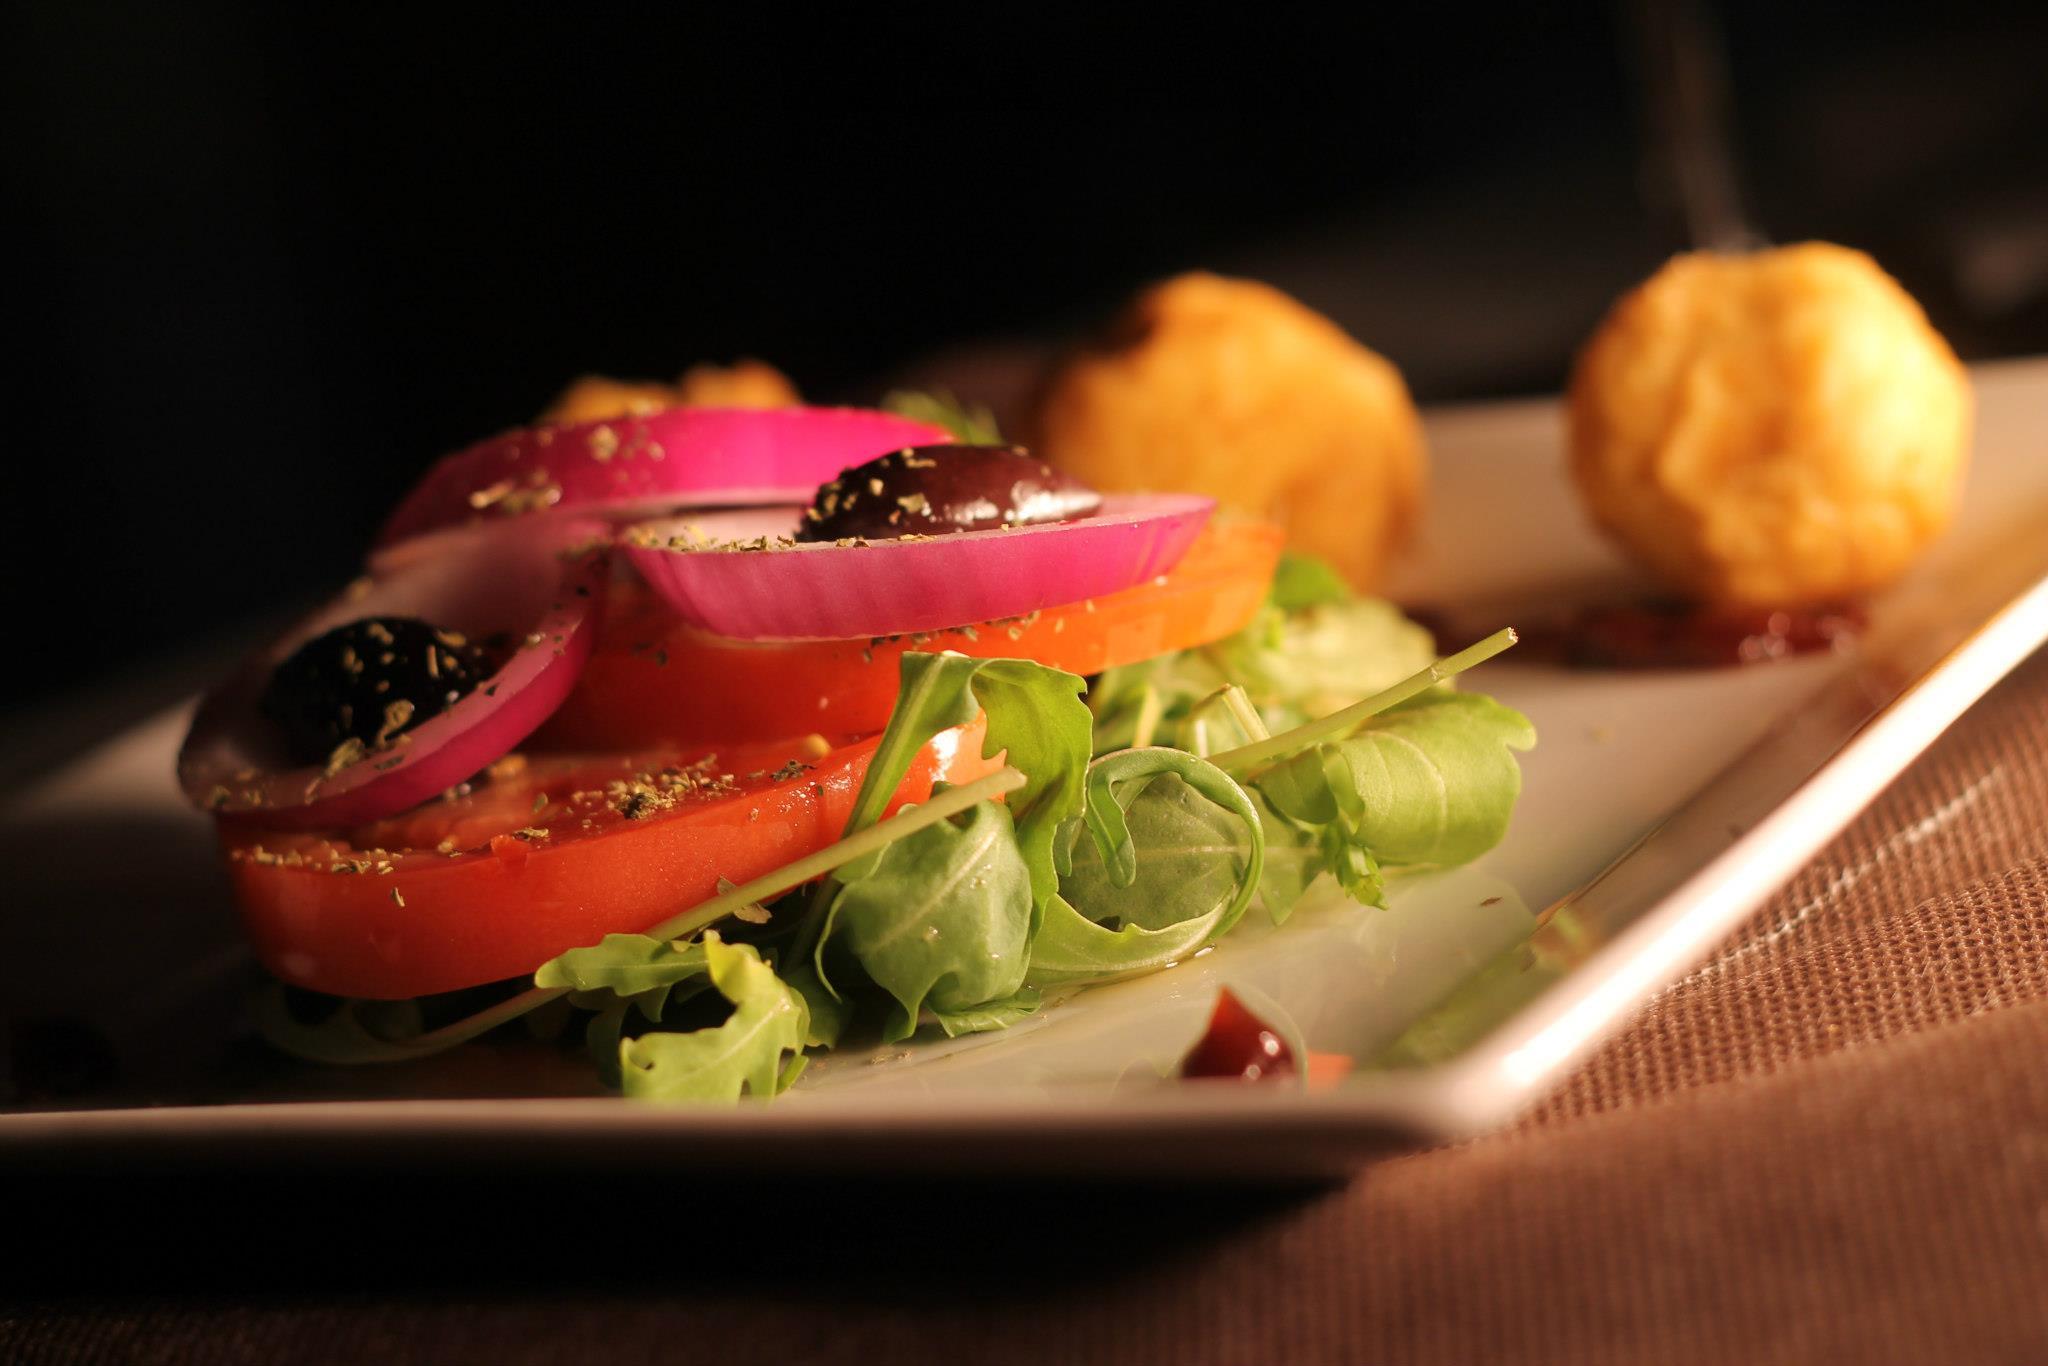 saganaki me salata-tabernagriega-barcelona